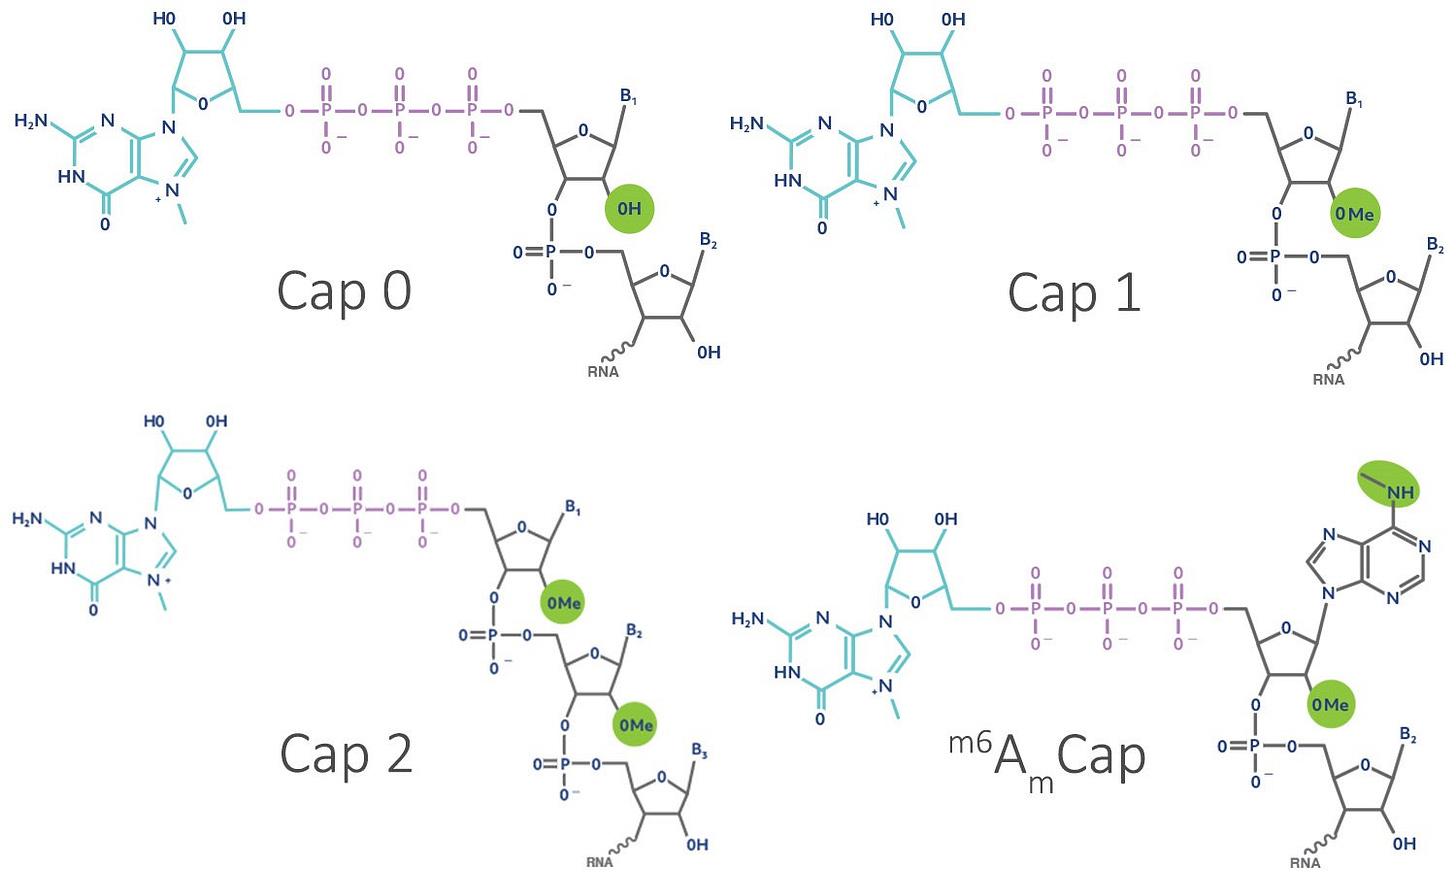 mRNA 5' Caps